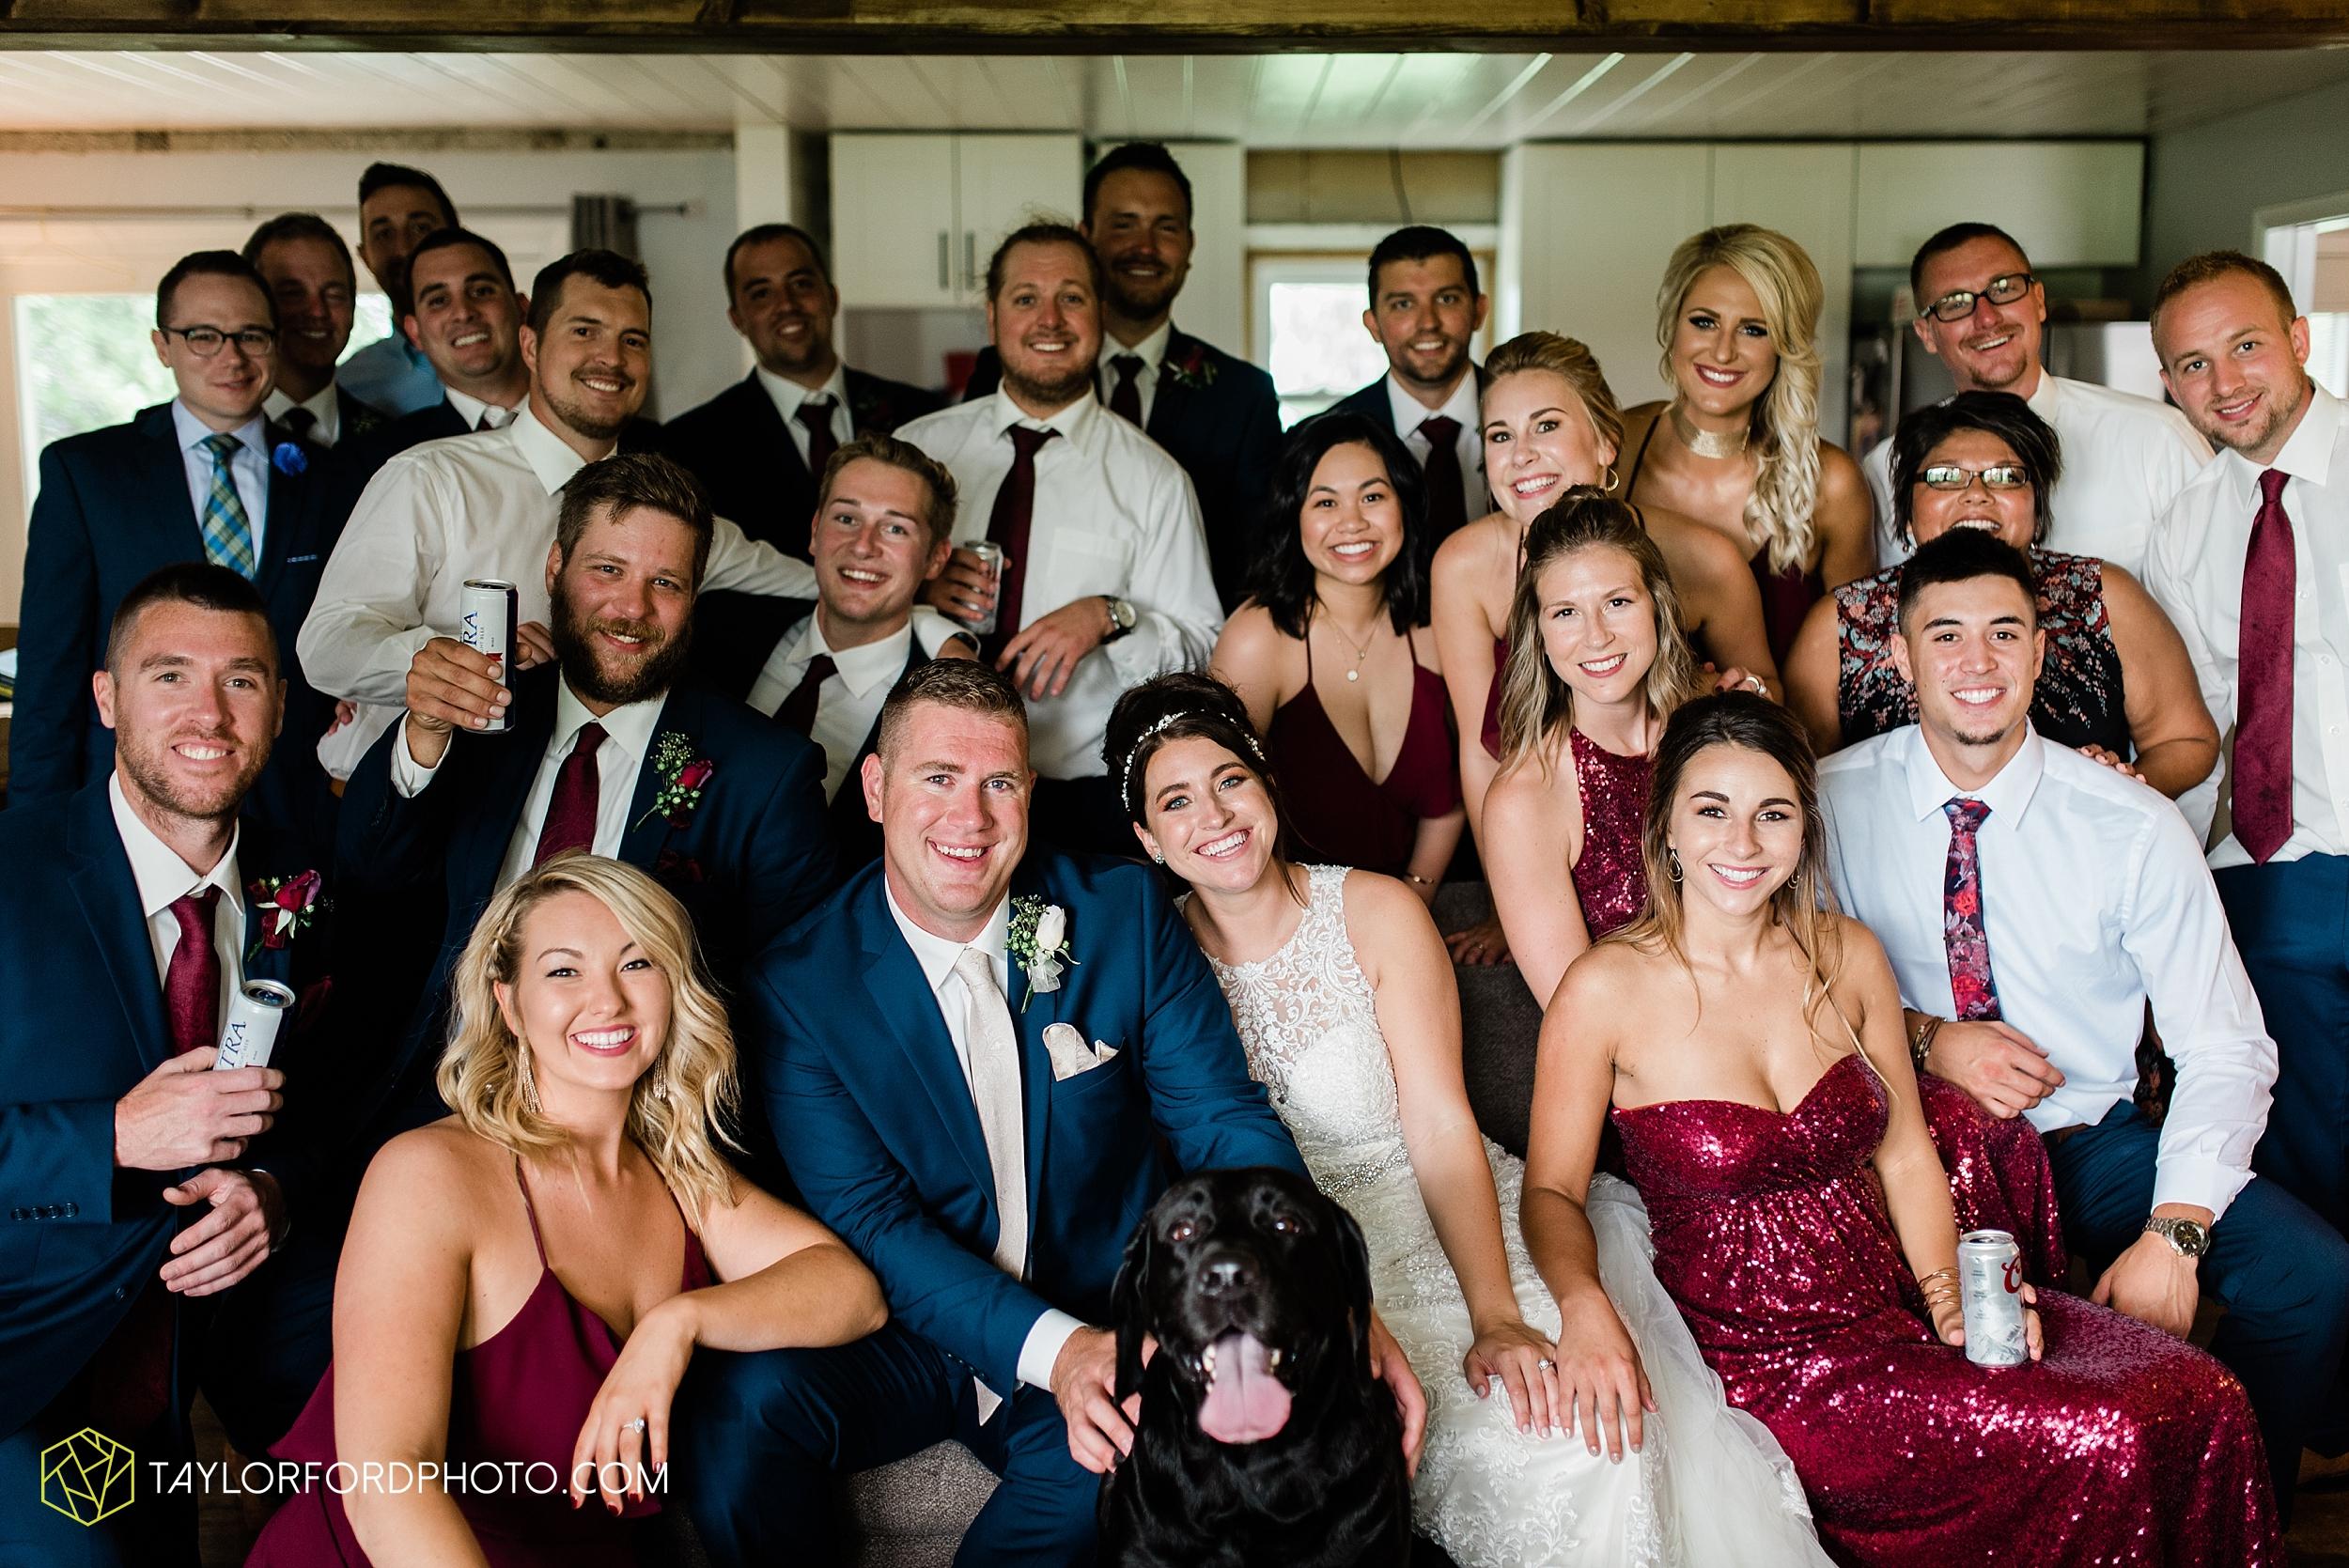 van-wert-ohio-first-united-methodist-church-county-dairy-barn-wedding-photographer-taylor-ford-photography_9861.jpg